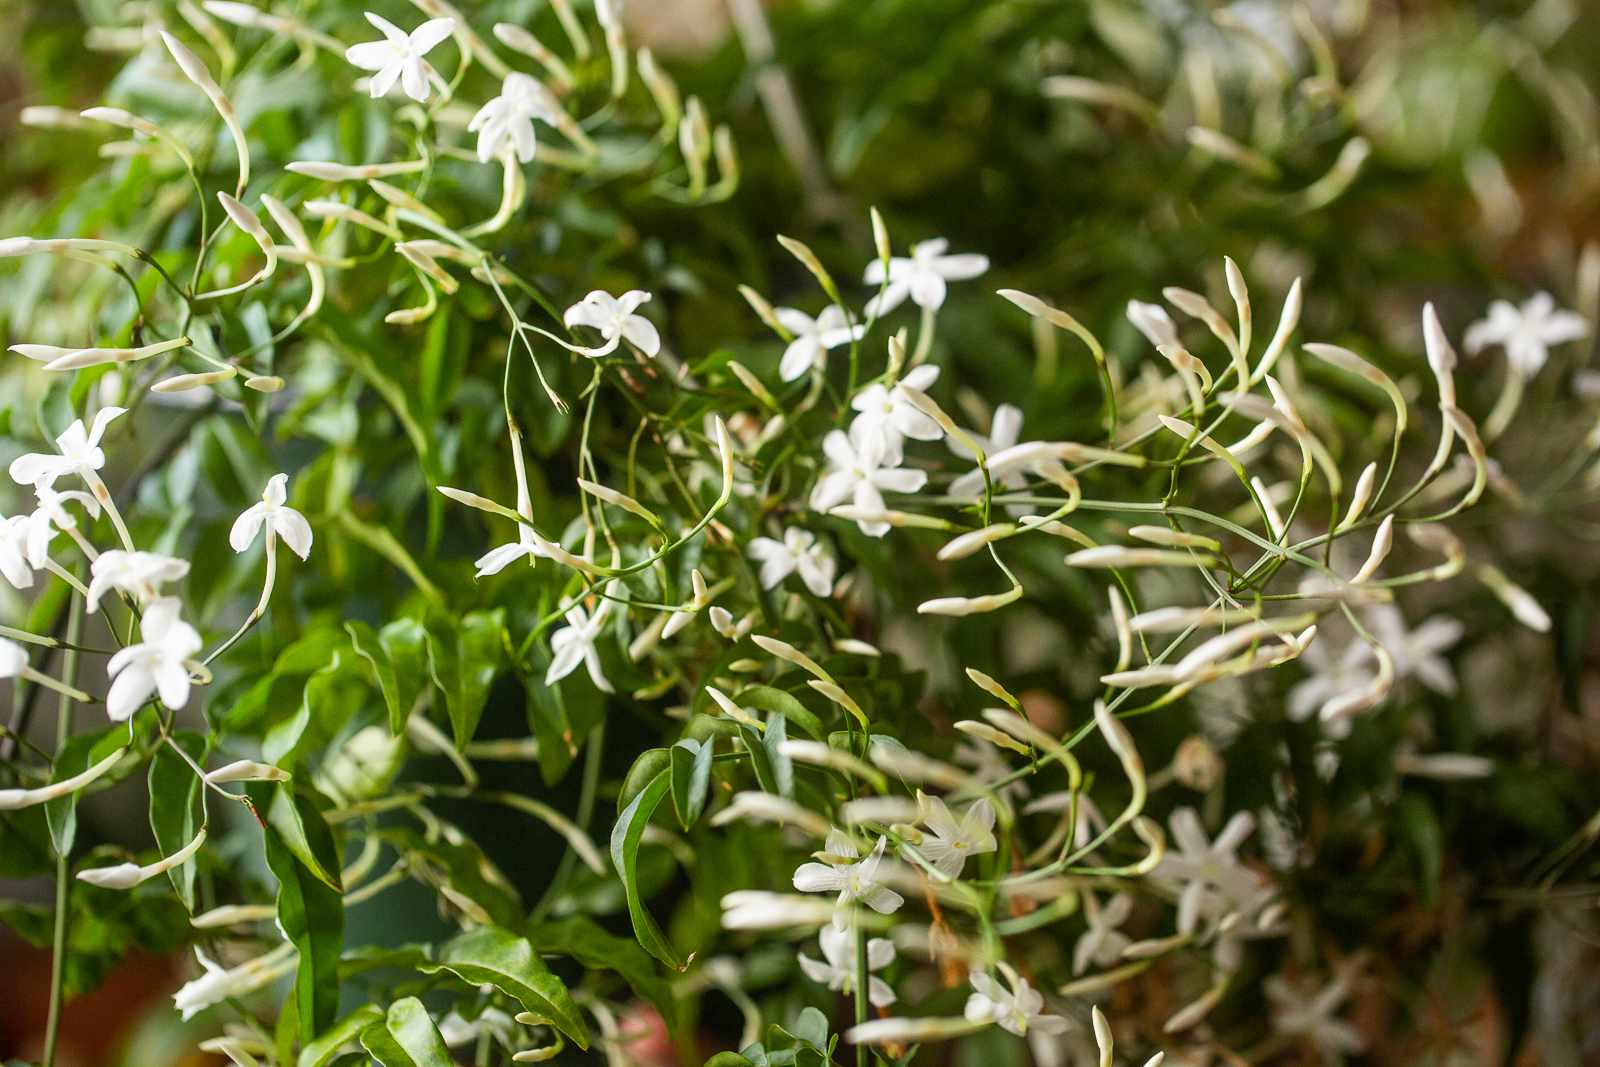 Vining jasmine flowers and buds closeup